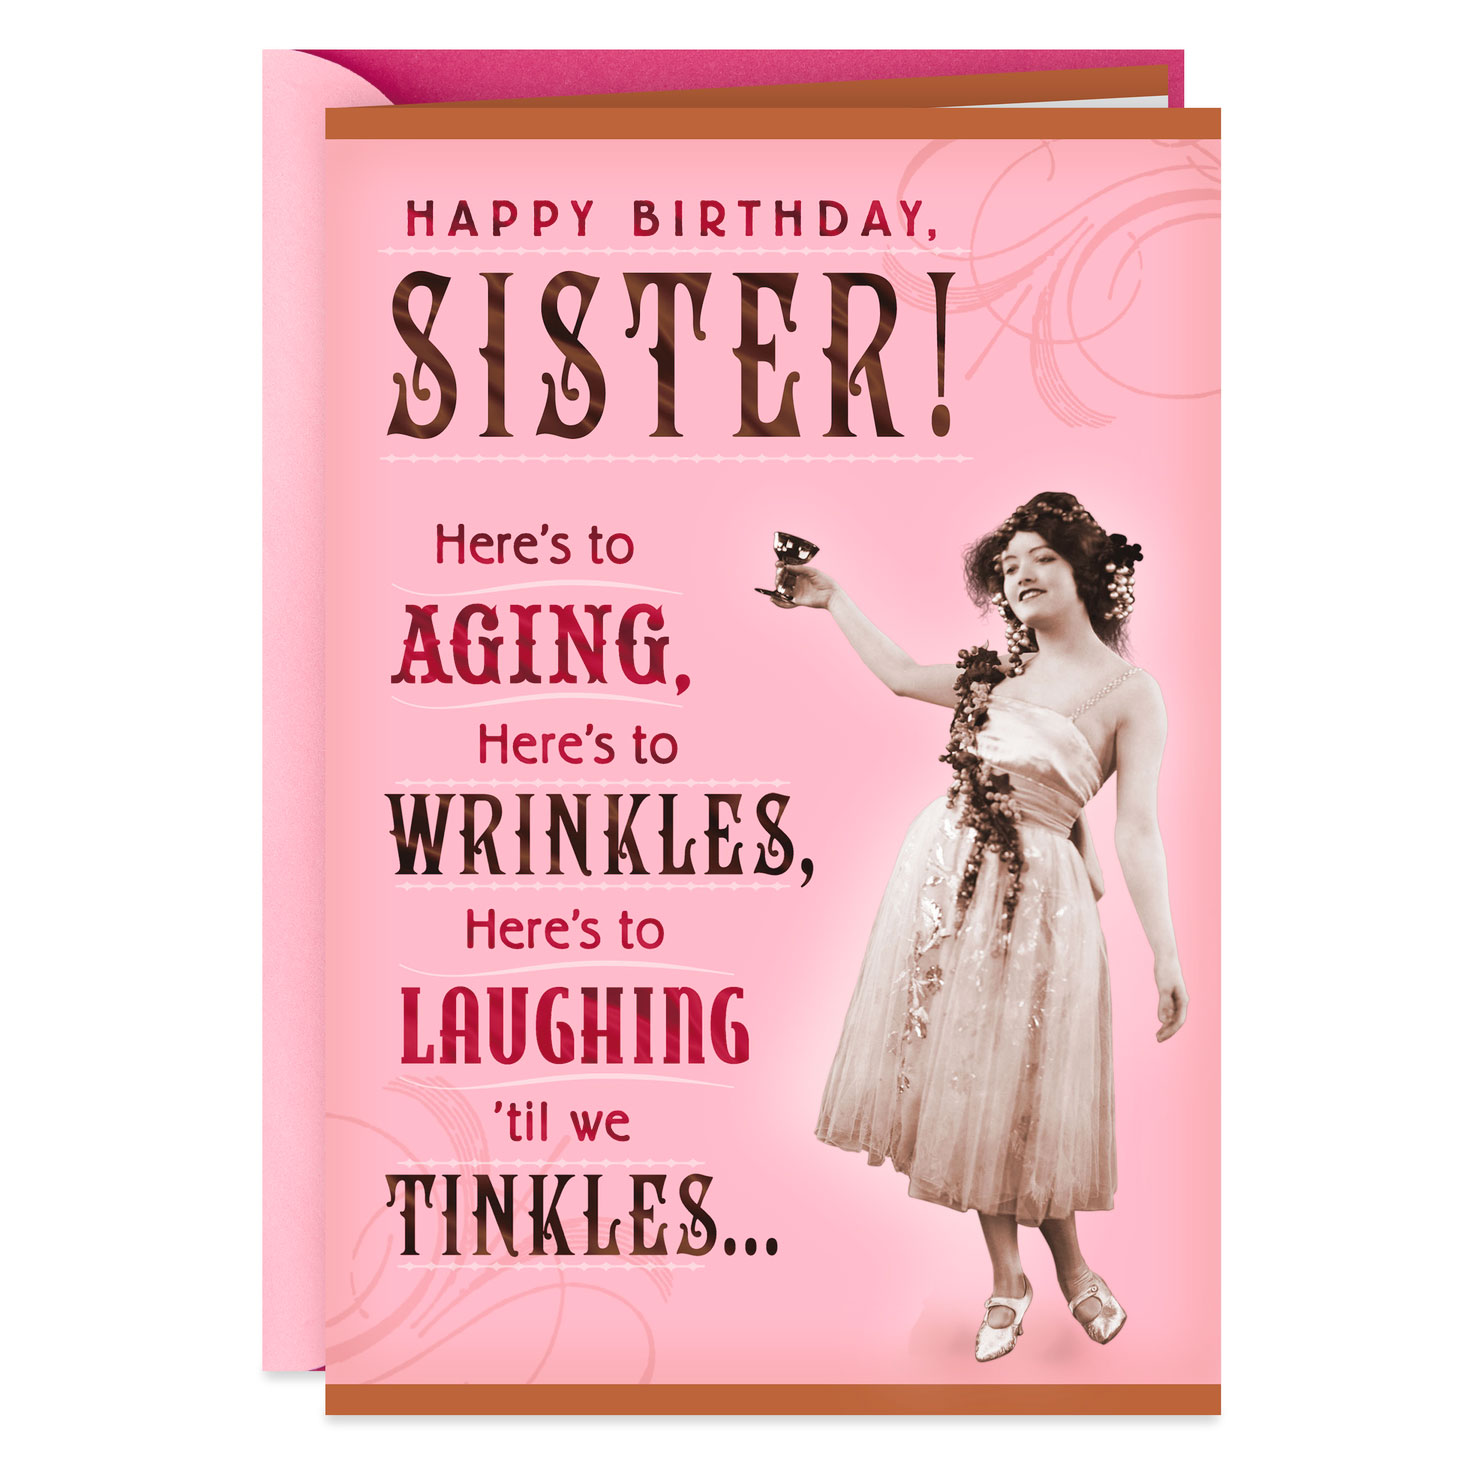 Handmade card sister Sister Birthday Birthday card for Sister Sister Birthday gift sister Crochet card sister Happy Birthday Sister